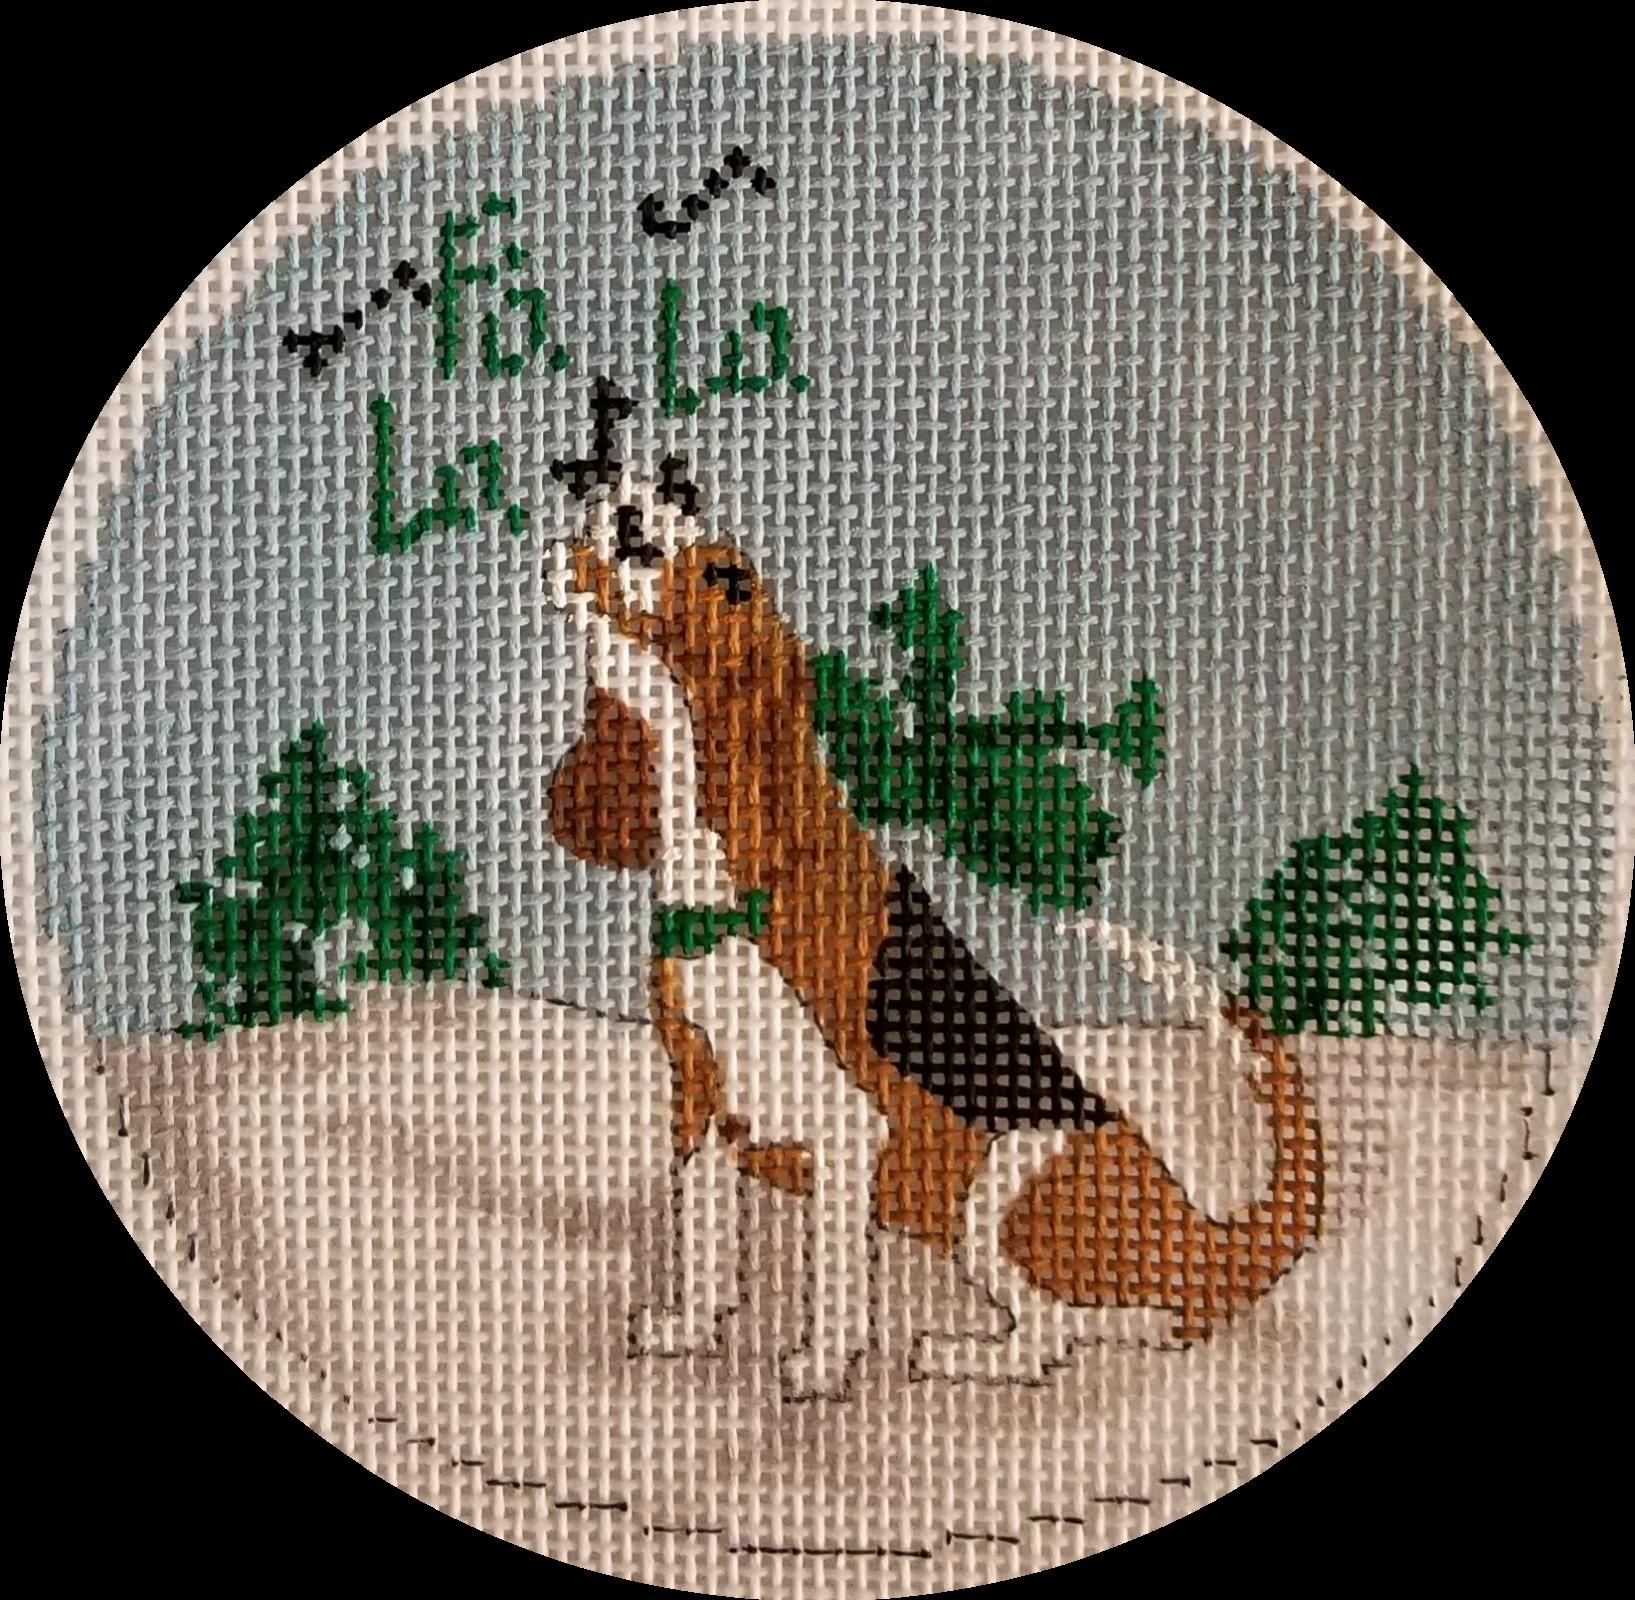 beagle's song